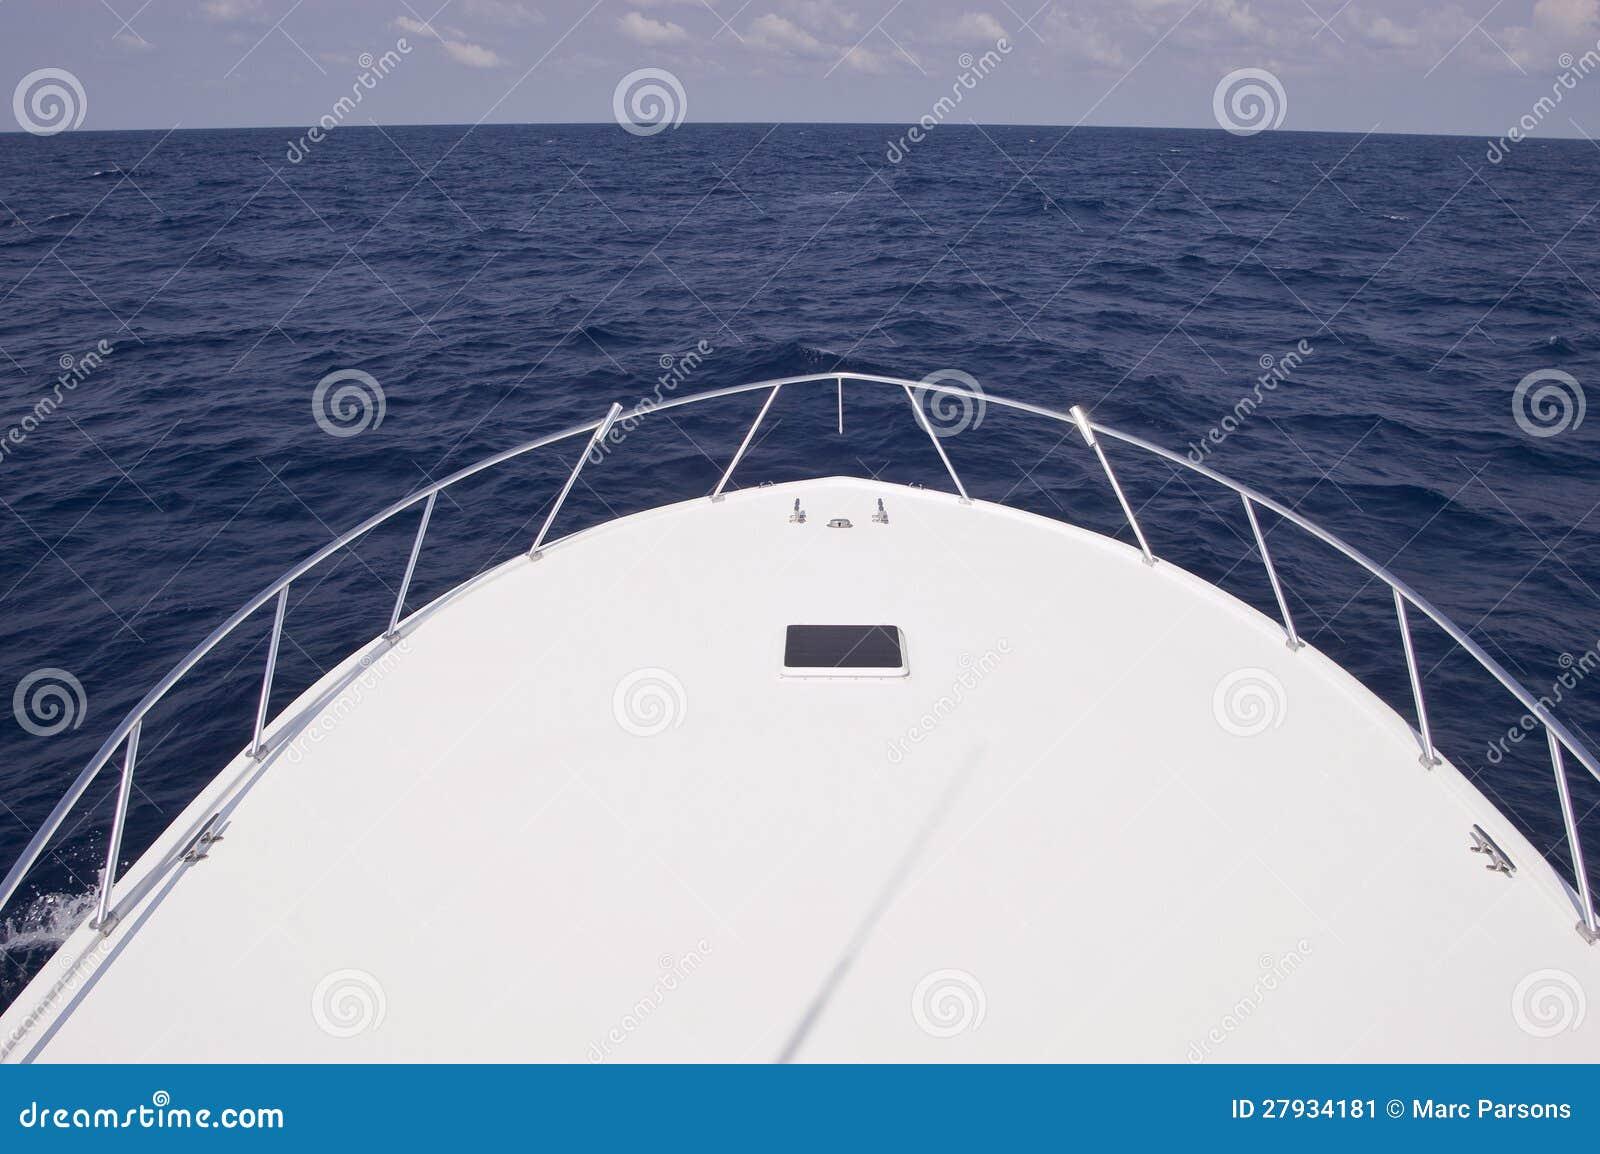 Fishing charter business plan sample